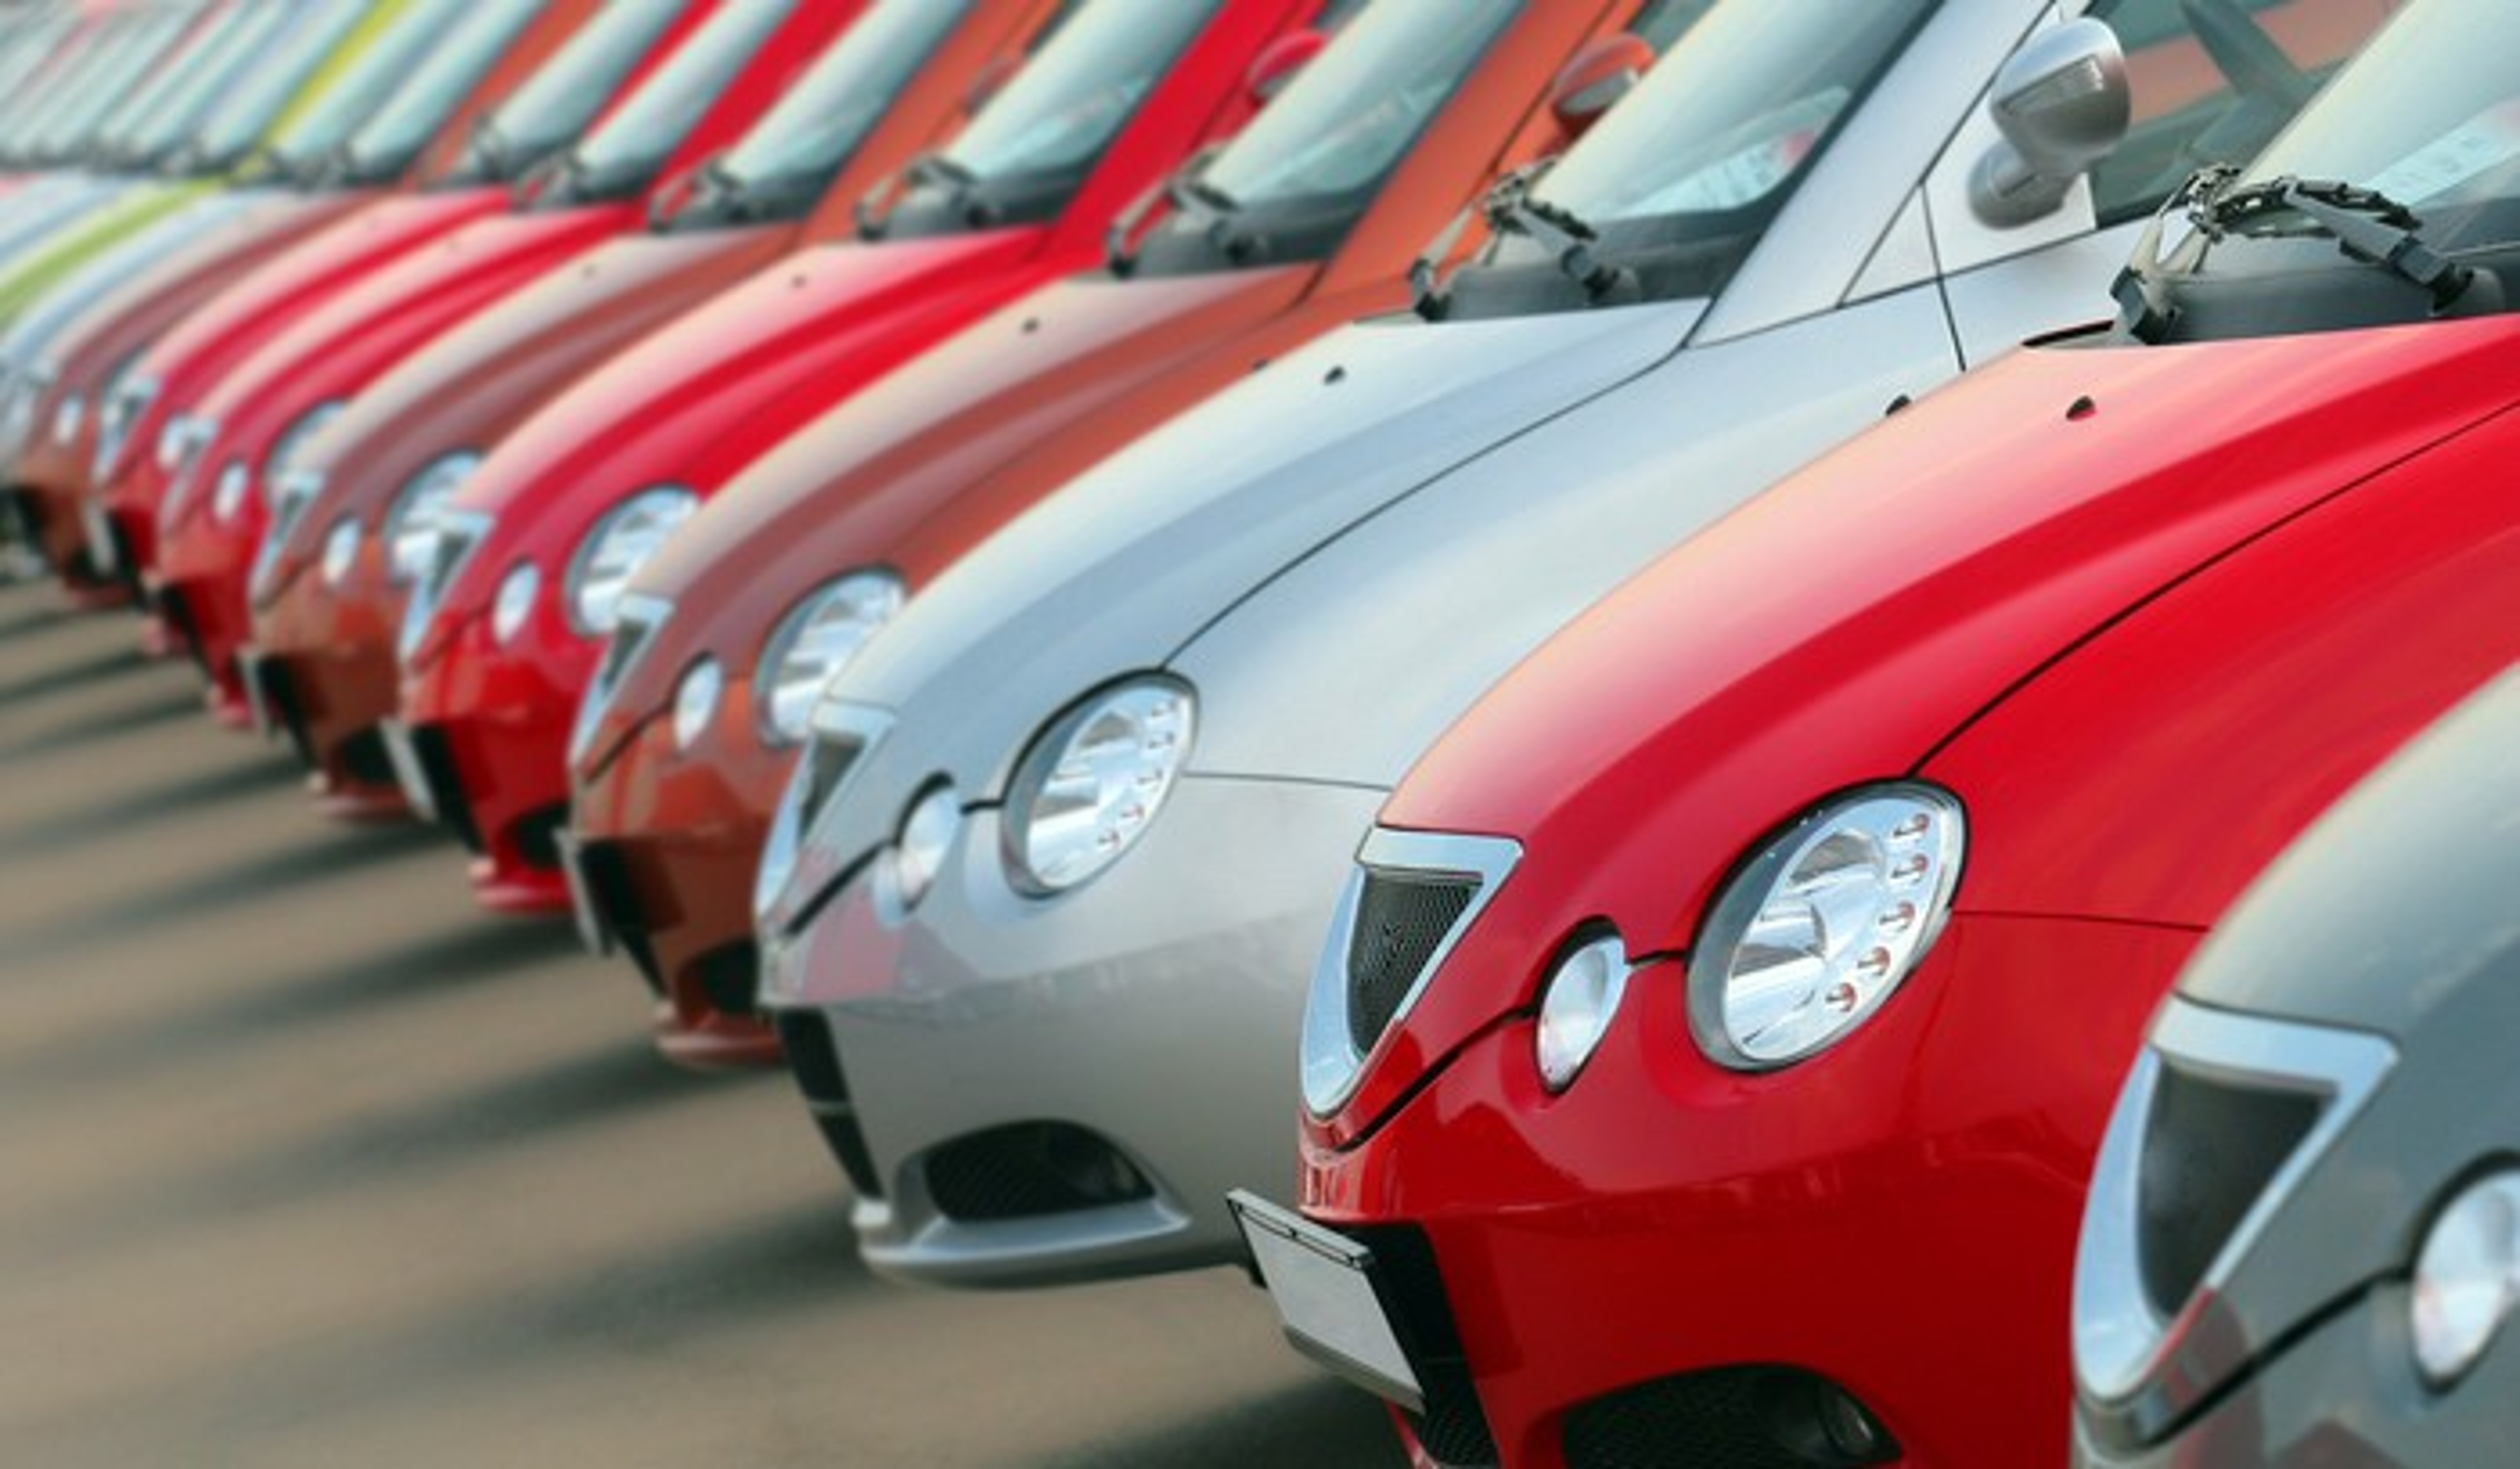 A fleet of cars in a parking lot.